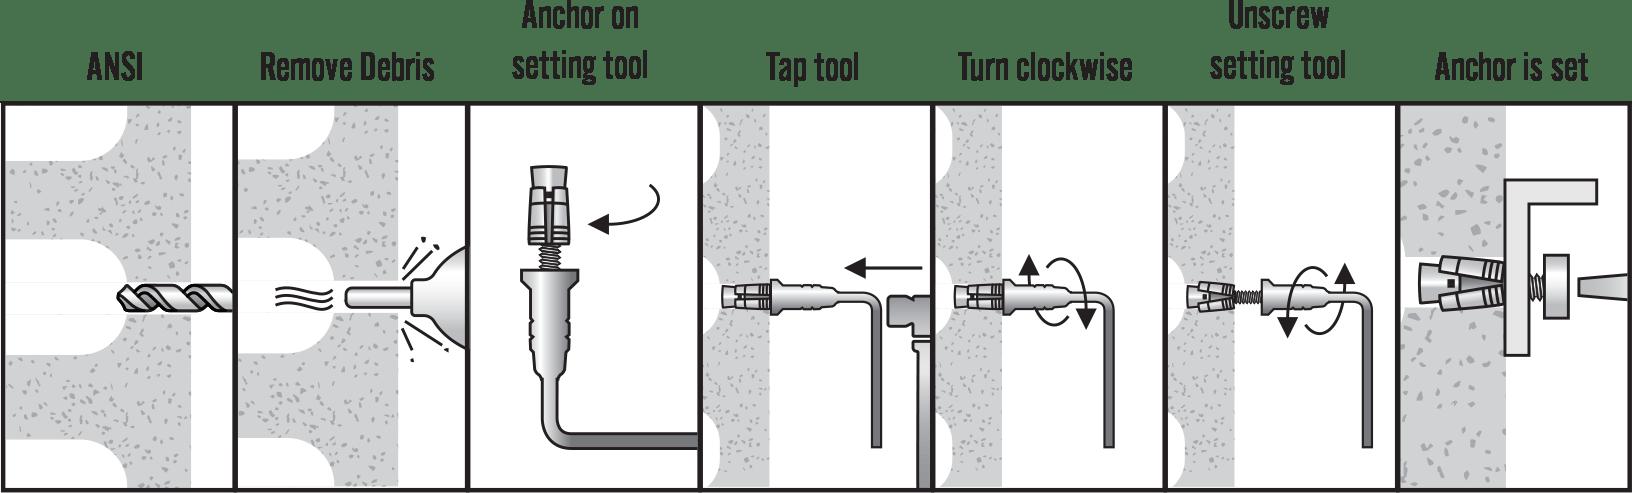 hollow-block-anchors-installation